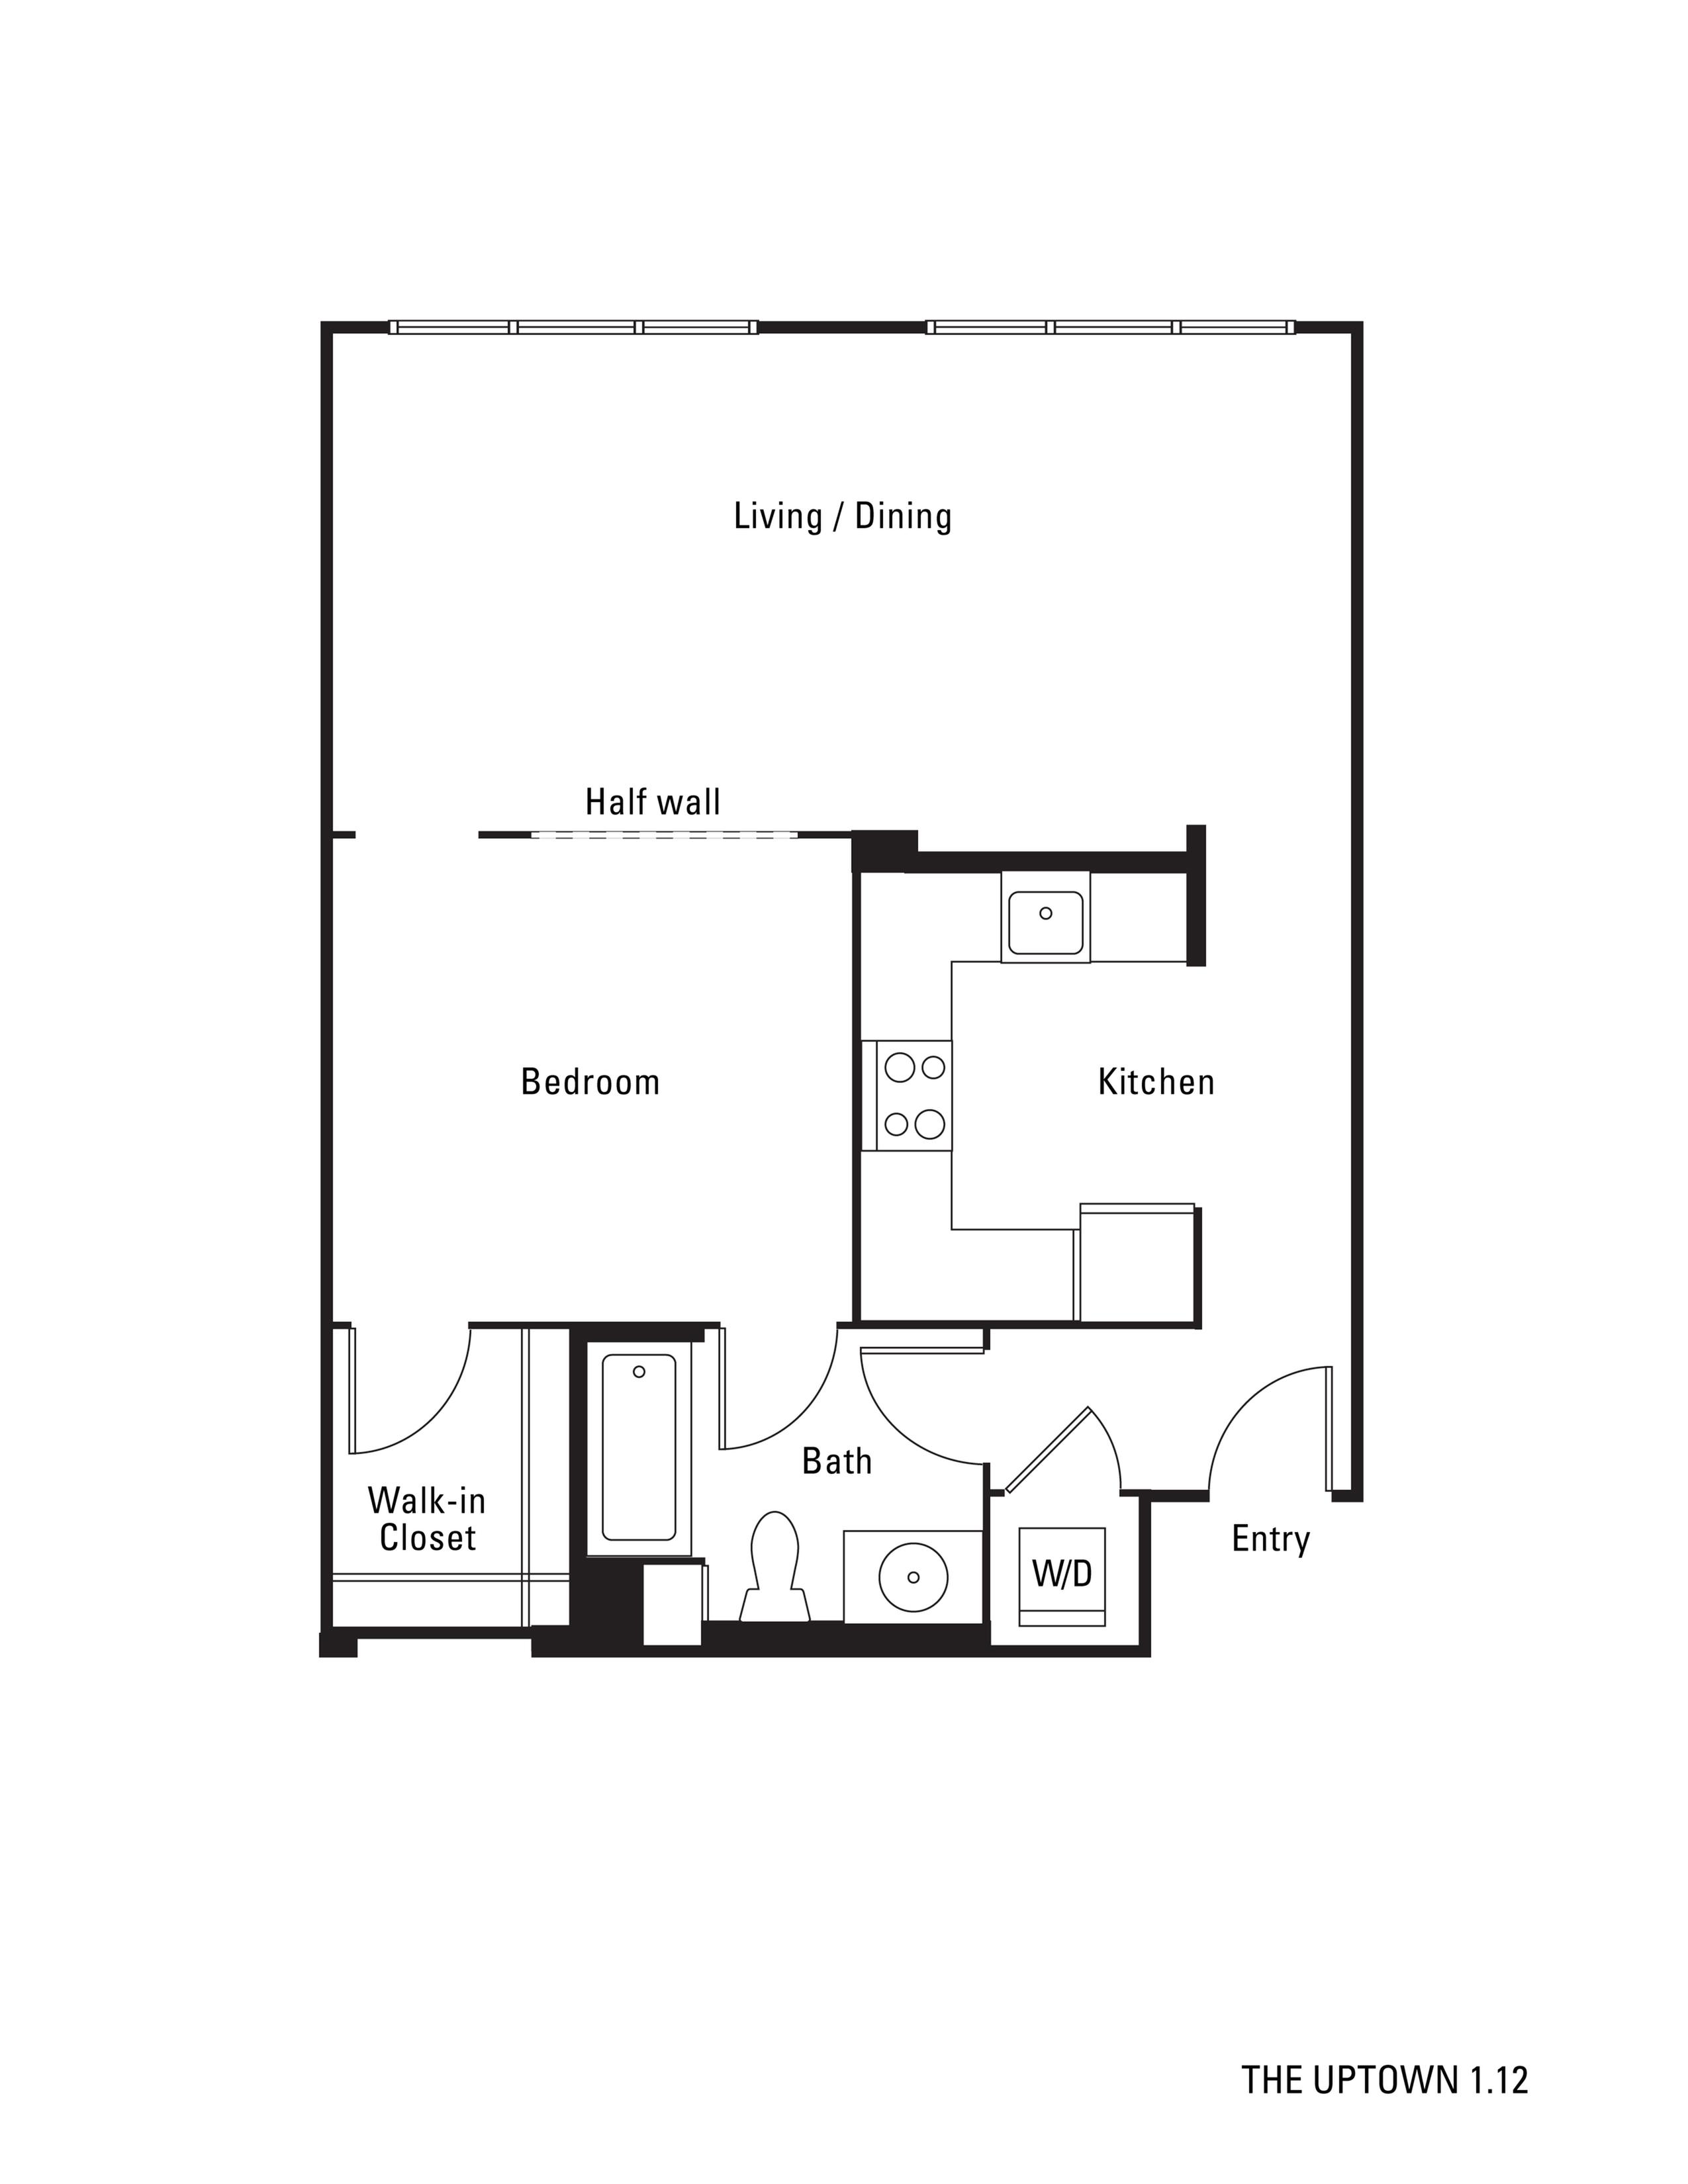 776 square foot studio one bath apartment floorplan image